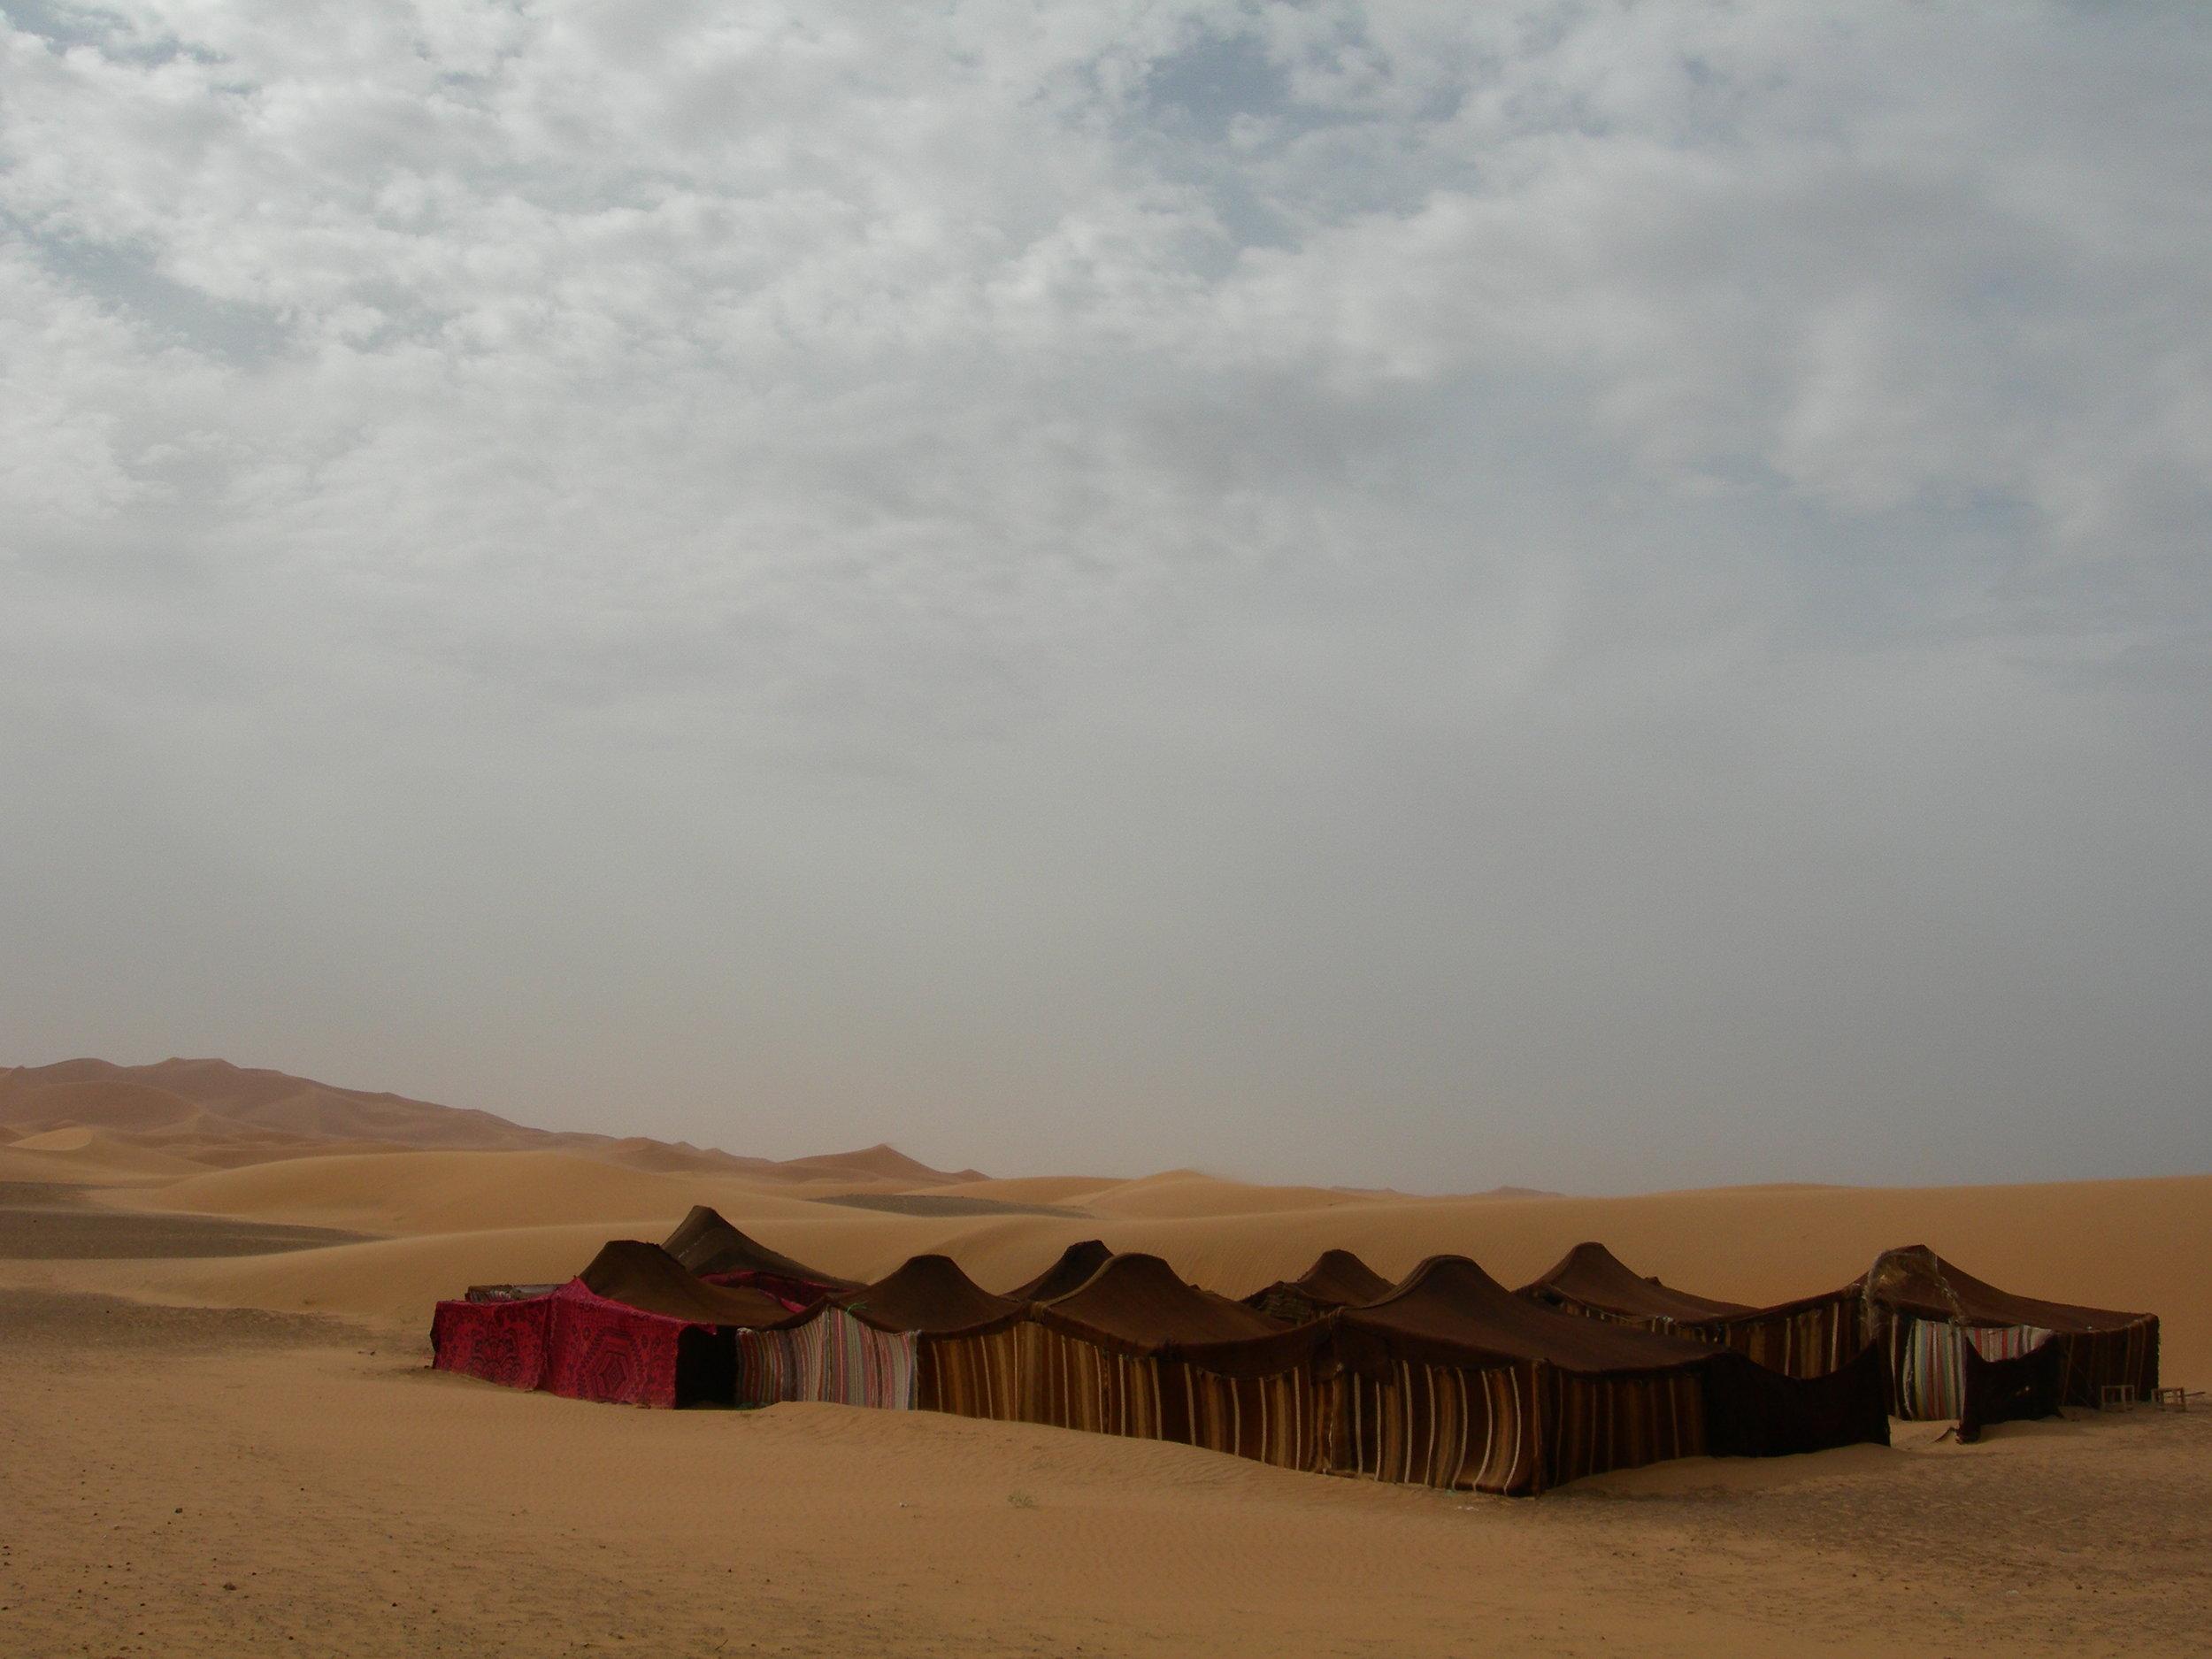 tents.JPG